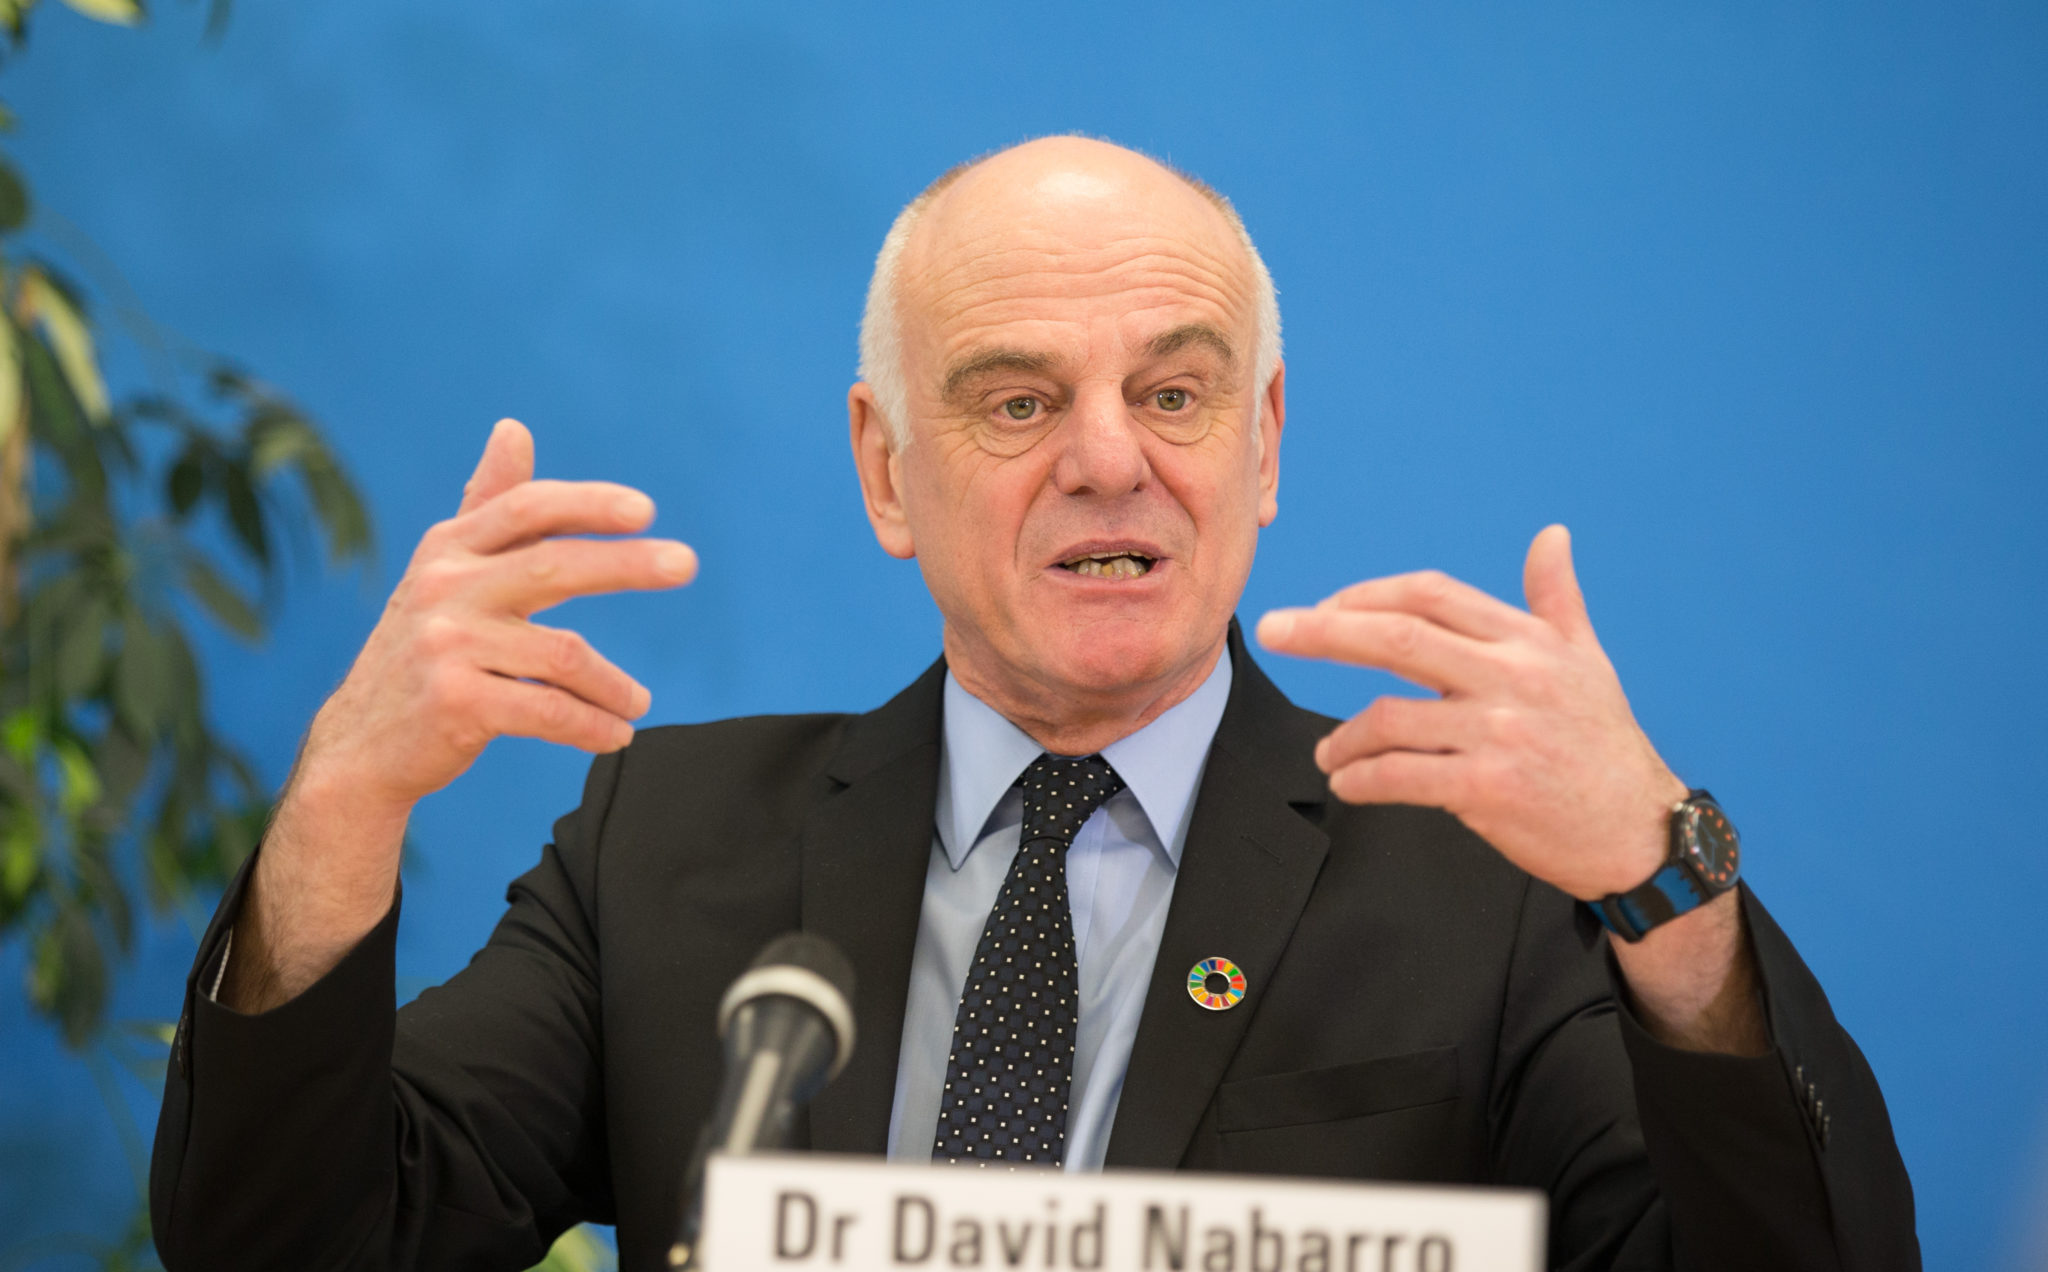 WHO Special Envoy Dr David Nabarro, 26-01-2017. Image: by Xinhua/Sipa USA